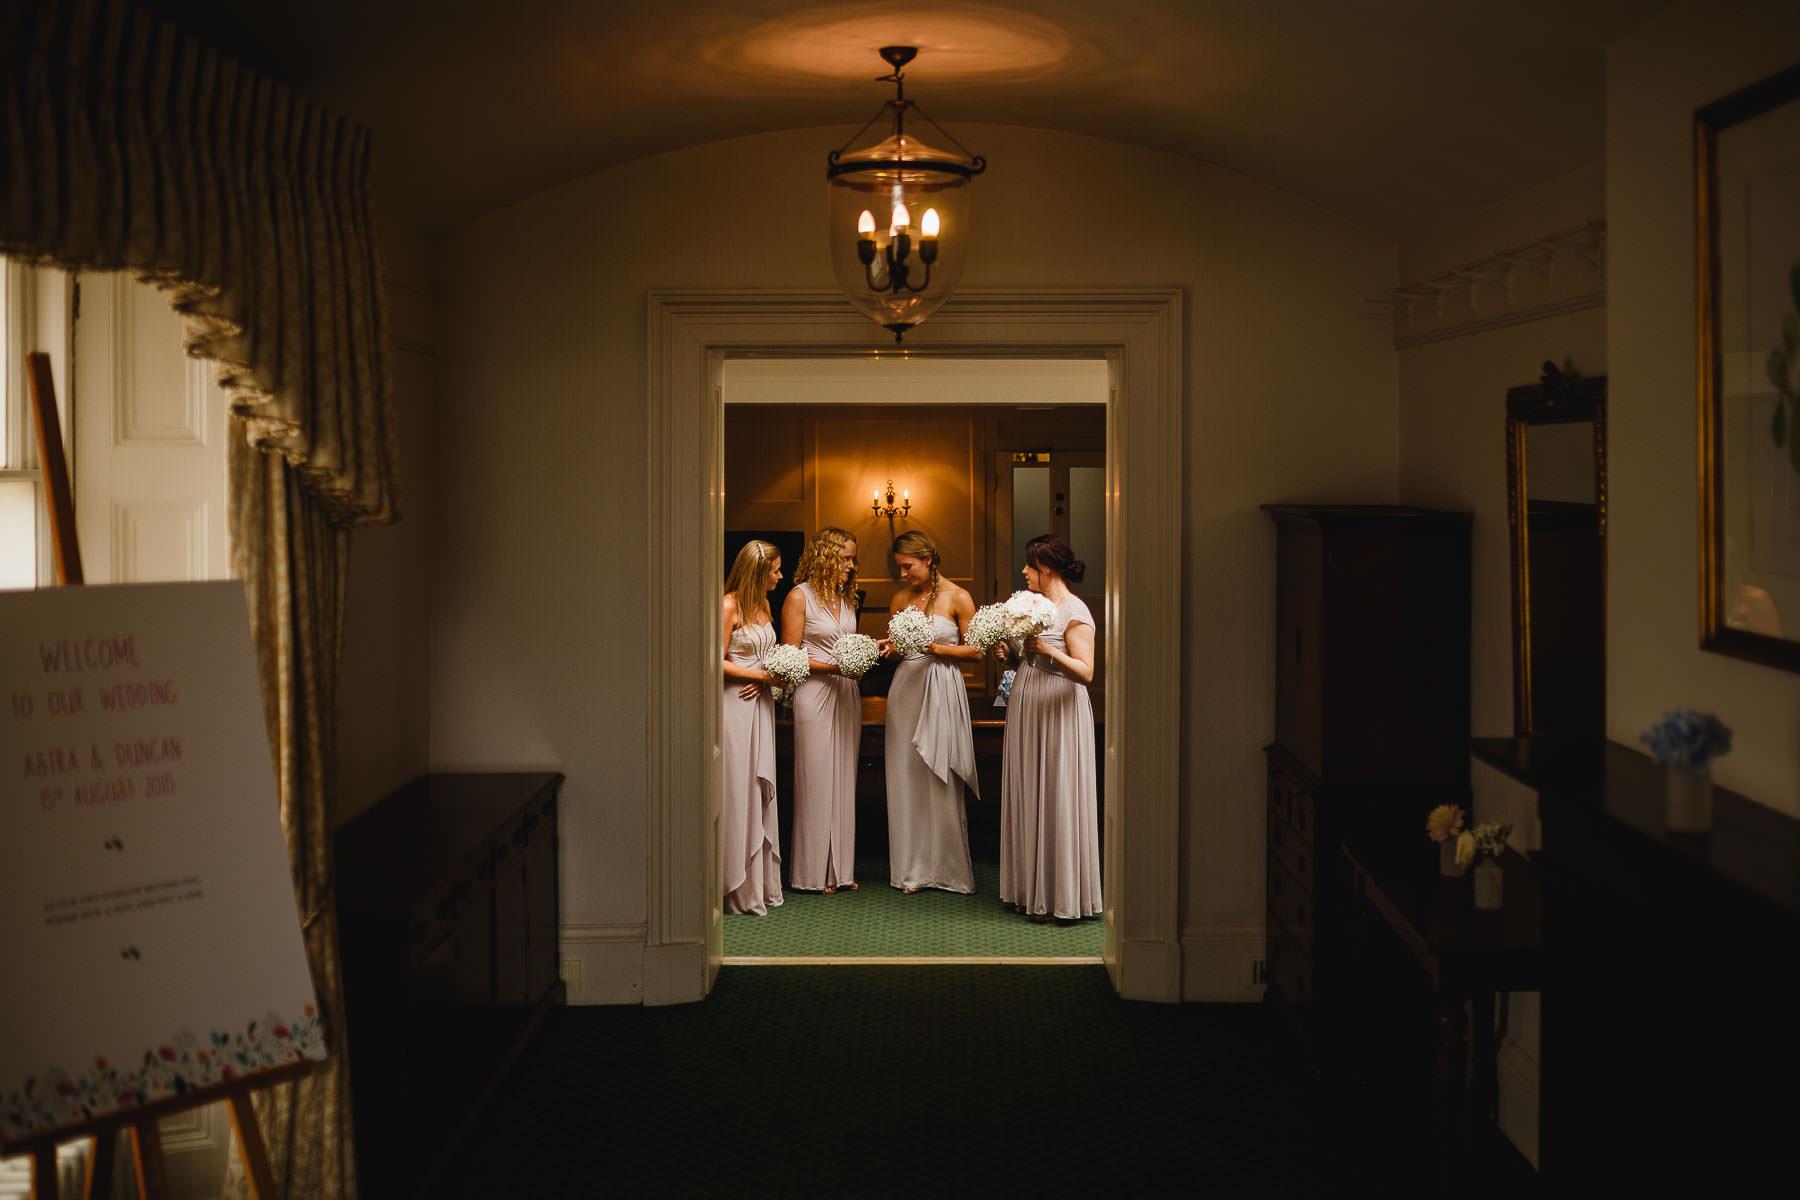 kew gardens wedding photography astra duncan9